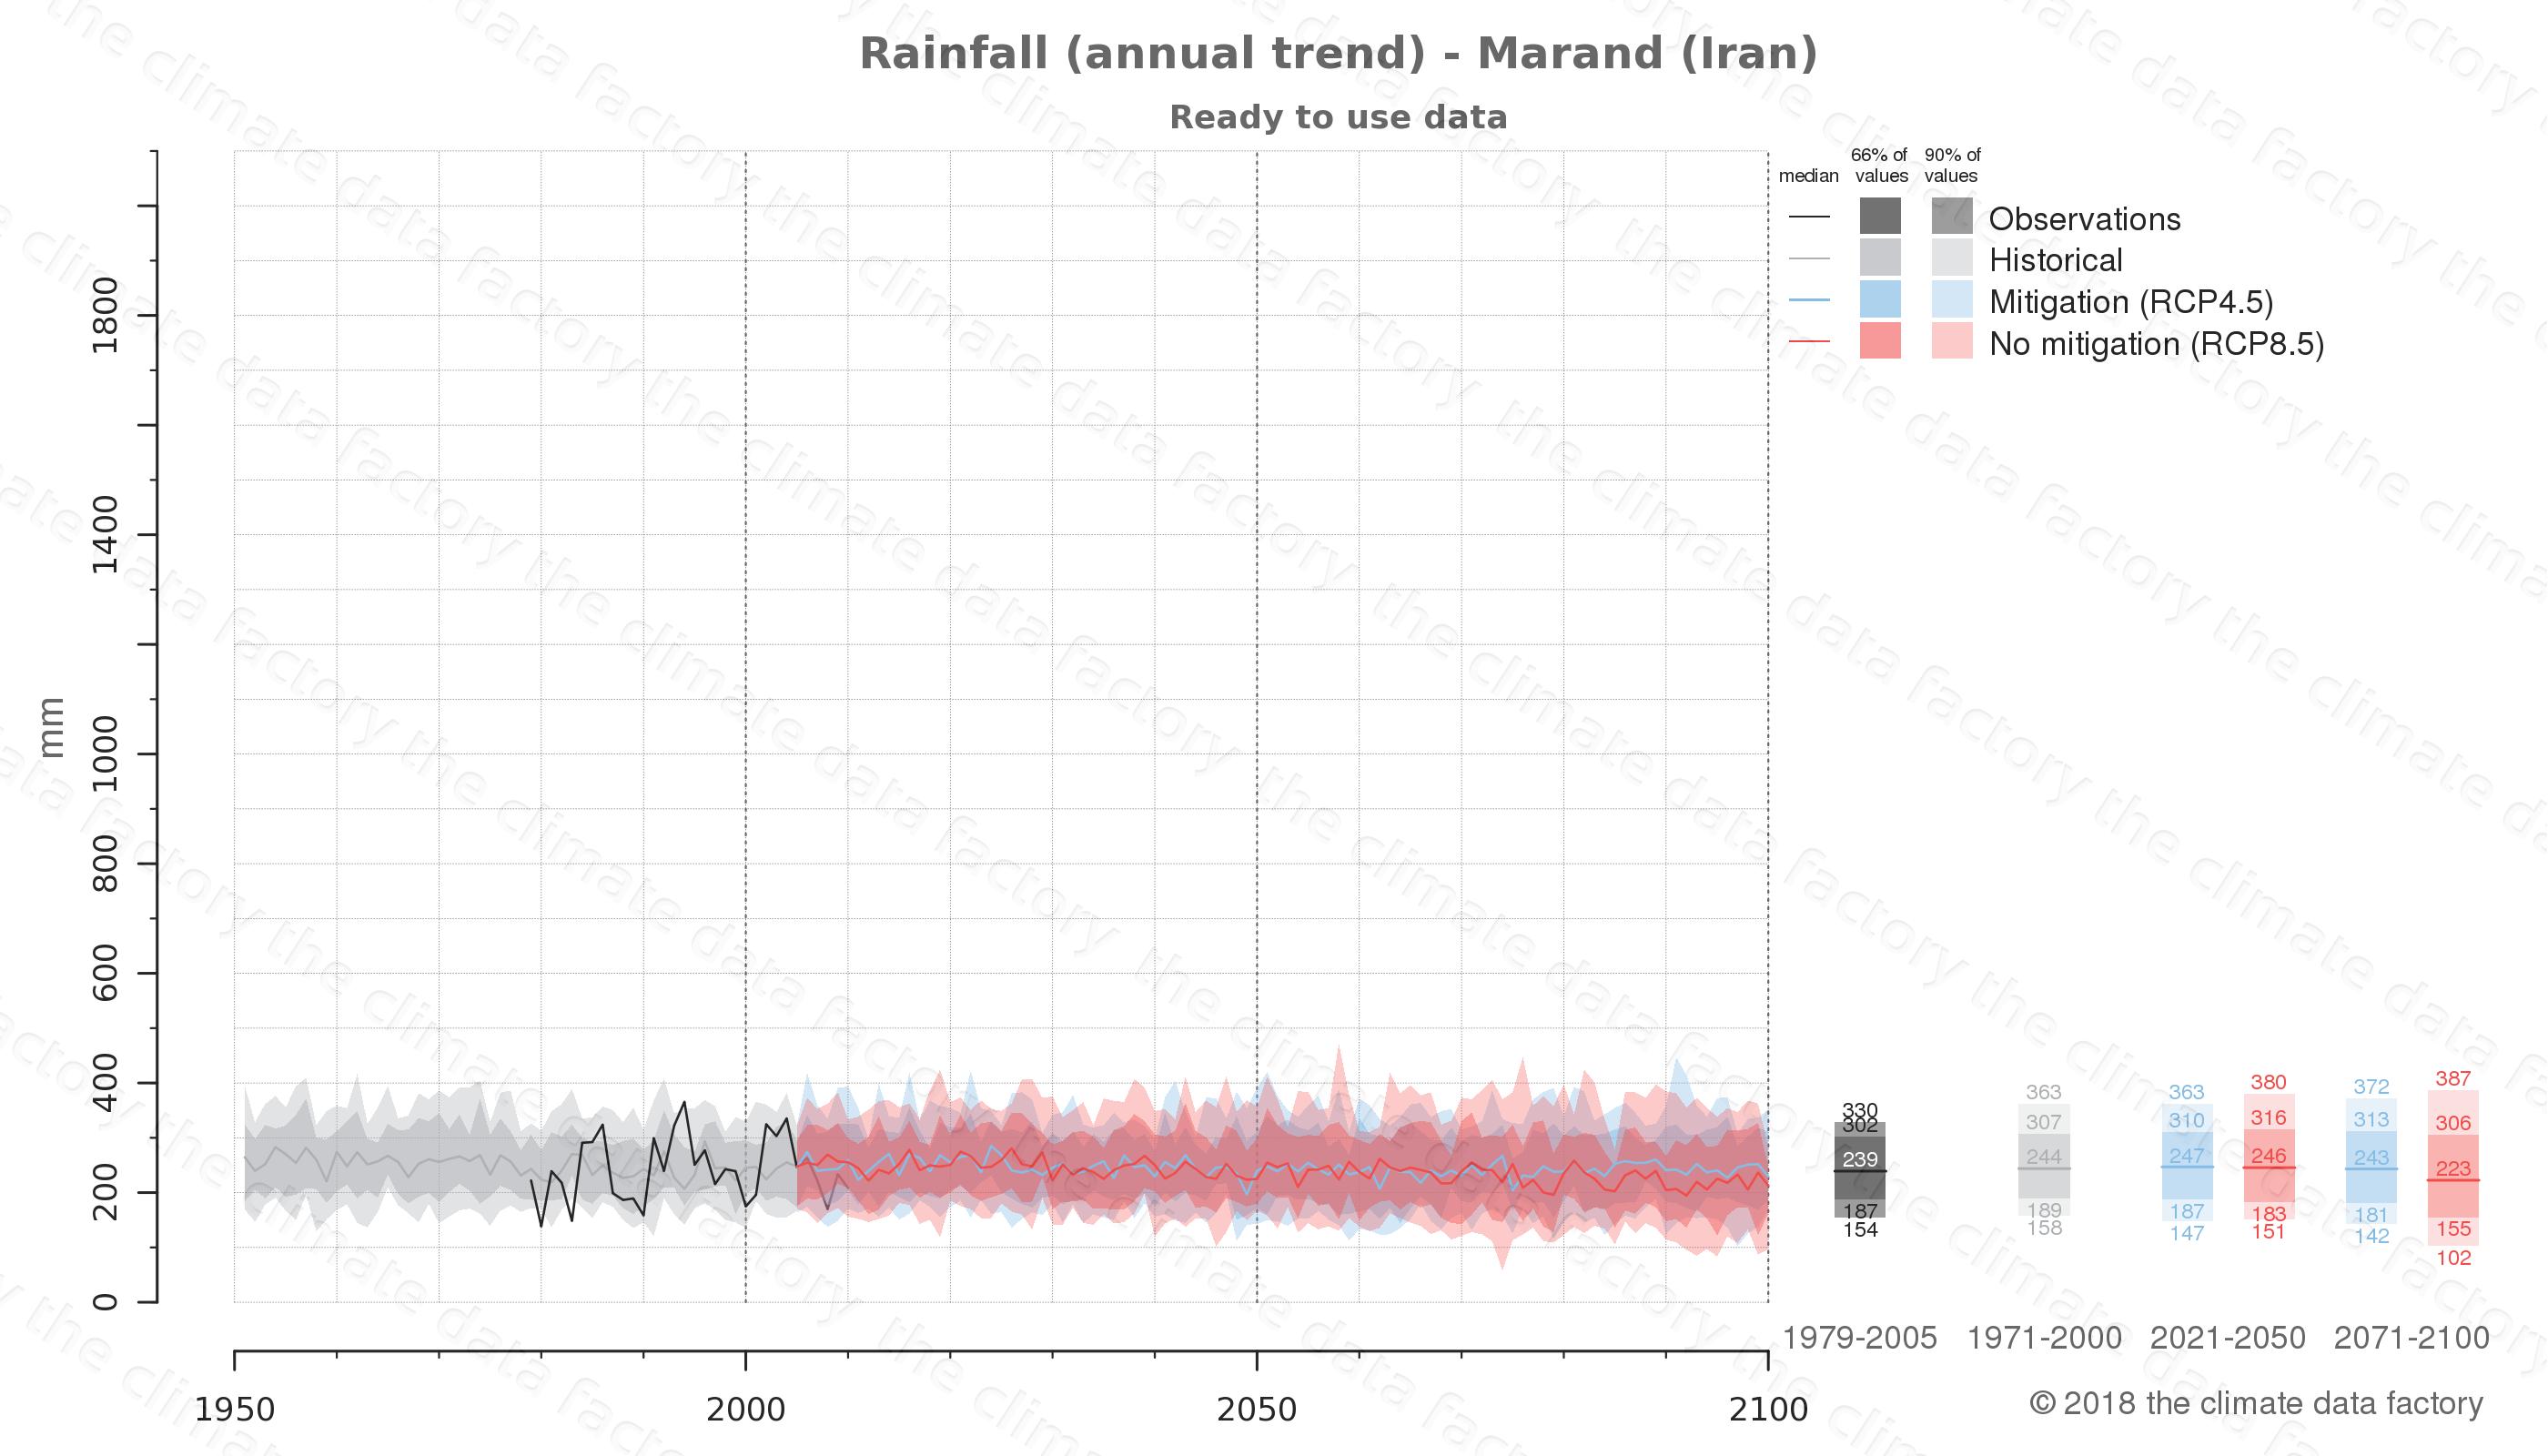 climate change data policy adaptation climate graph city data rainfall marand iran